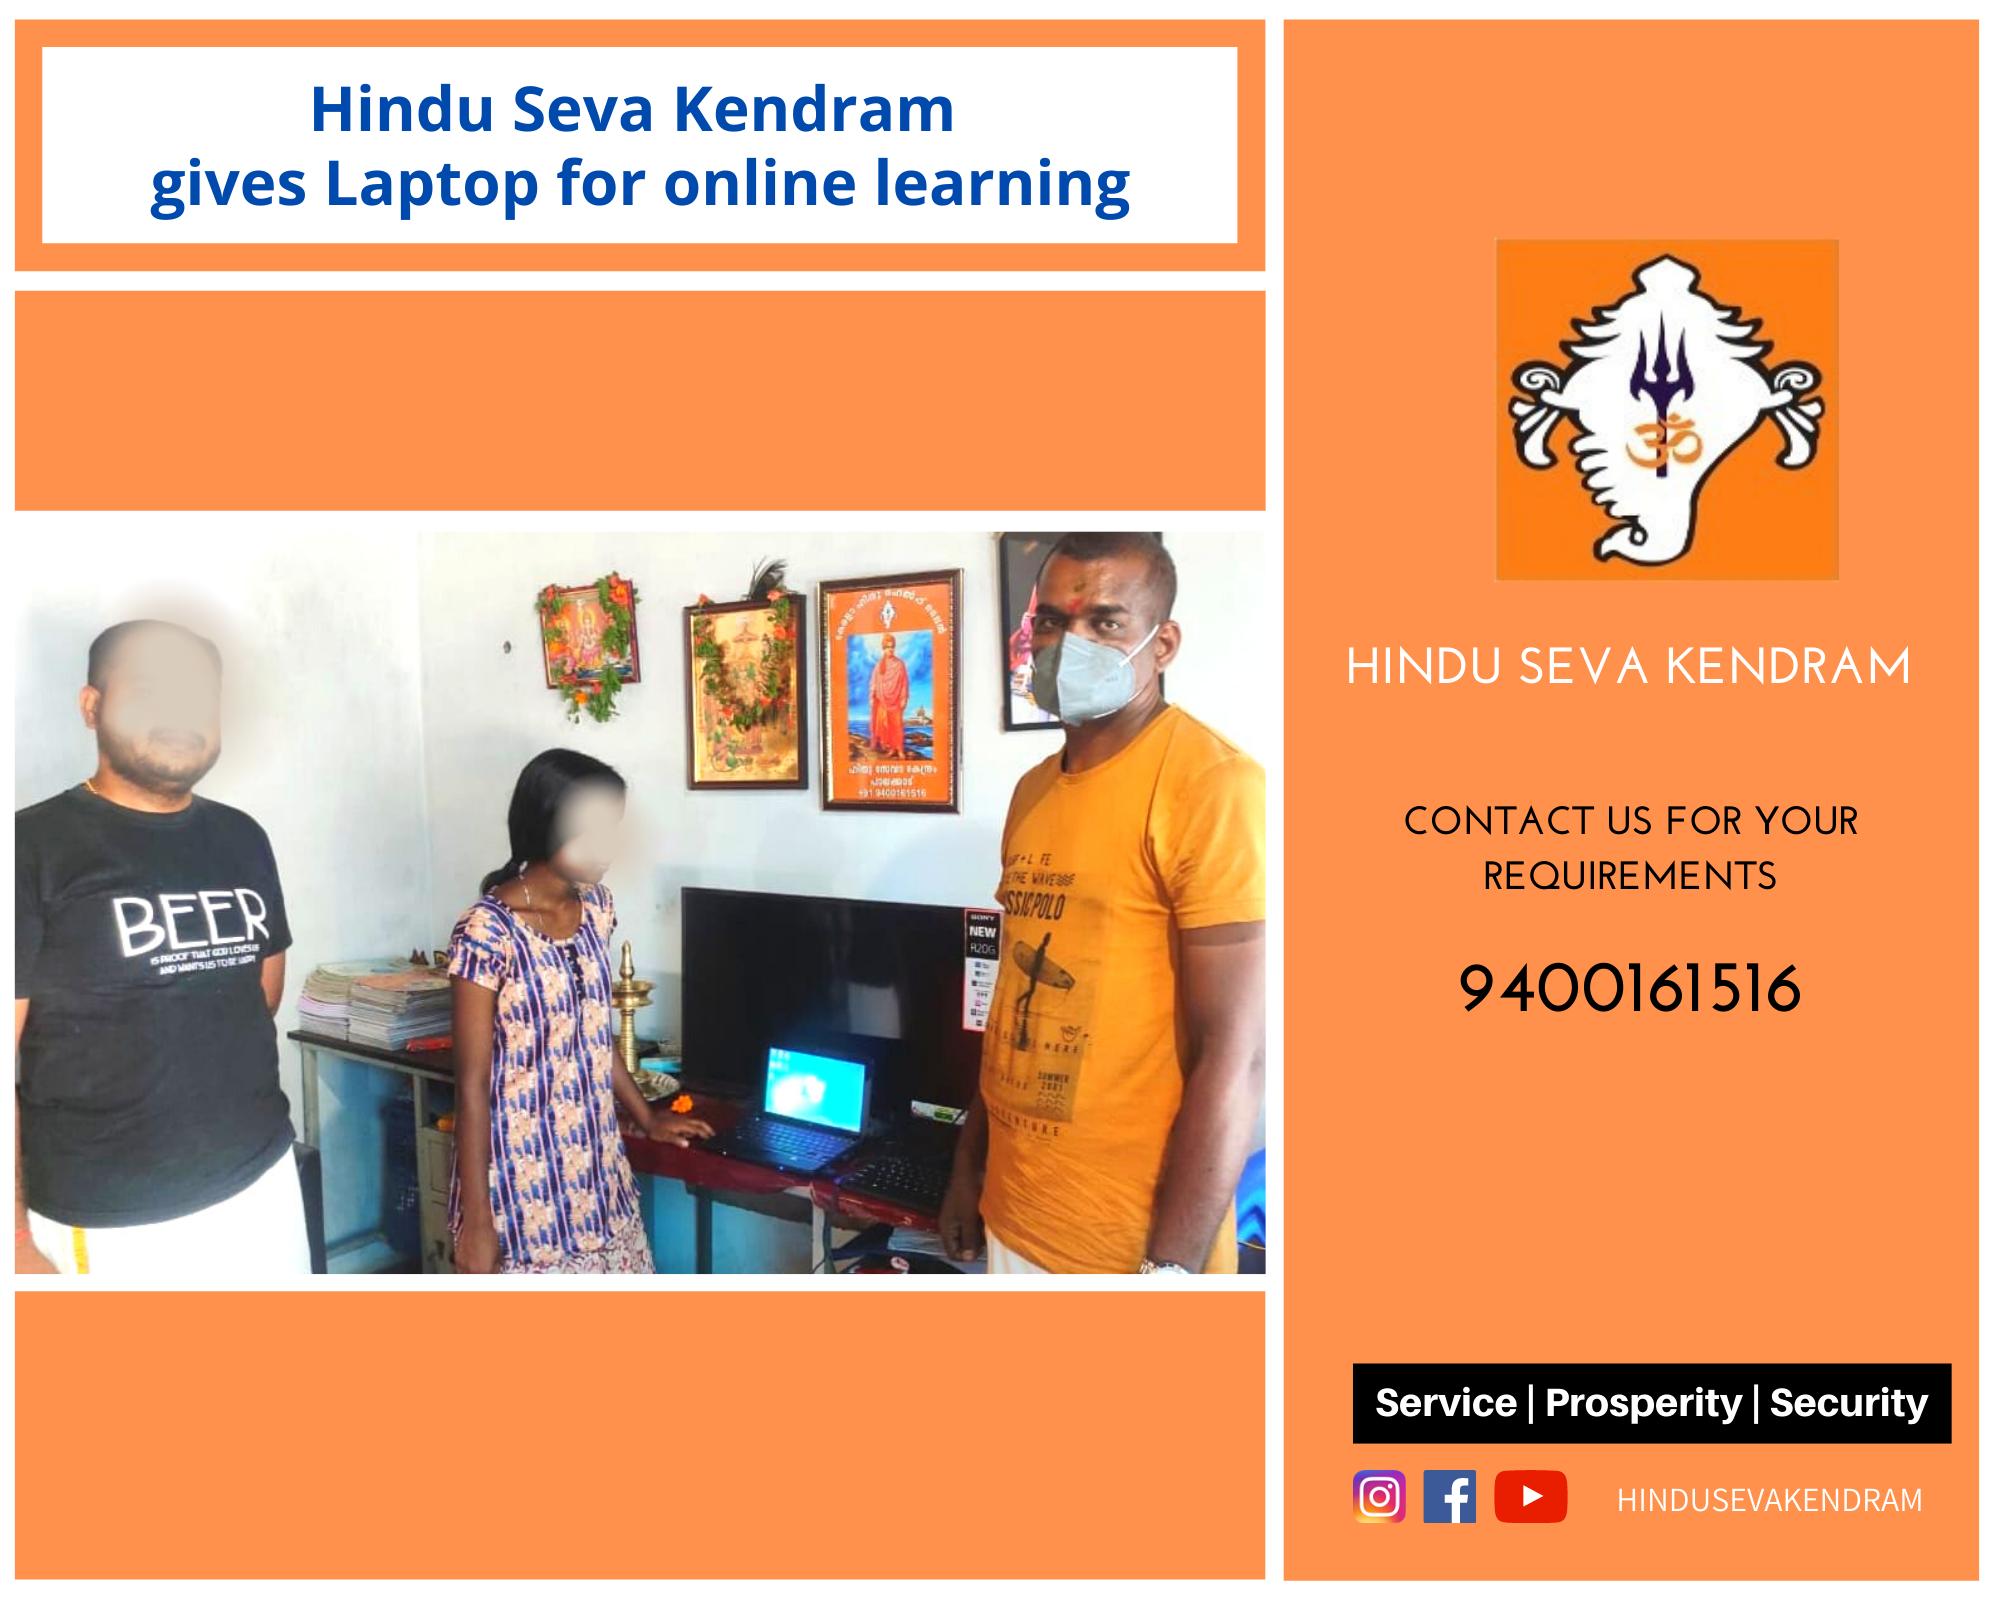 Hindu Seva Kendram gives Laptop for Online Learning